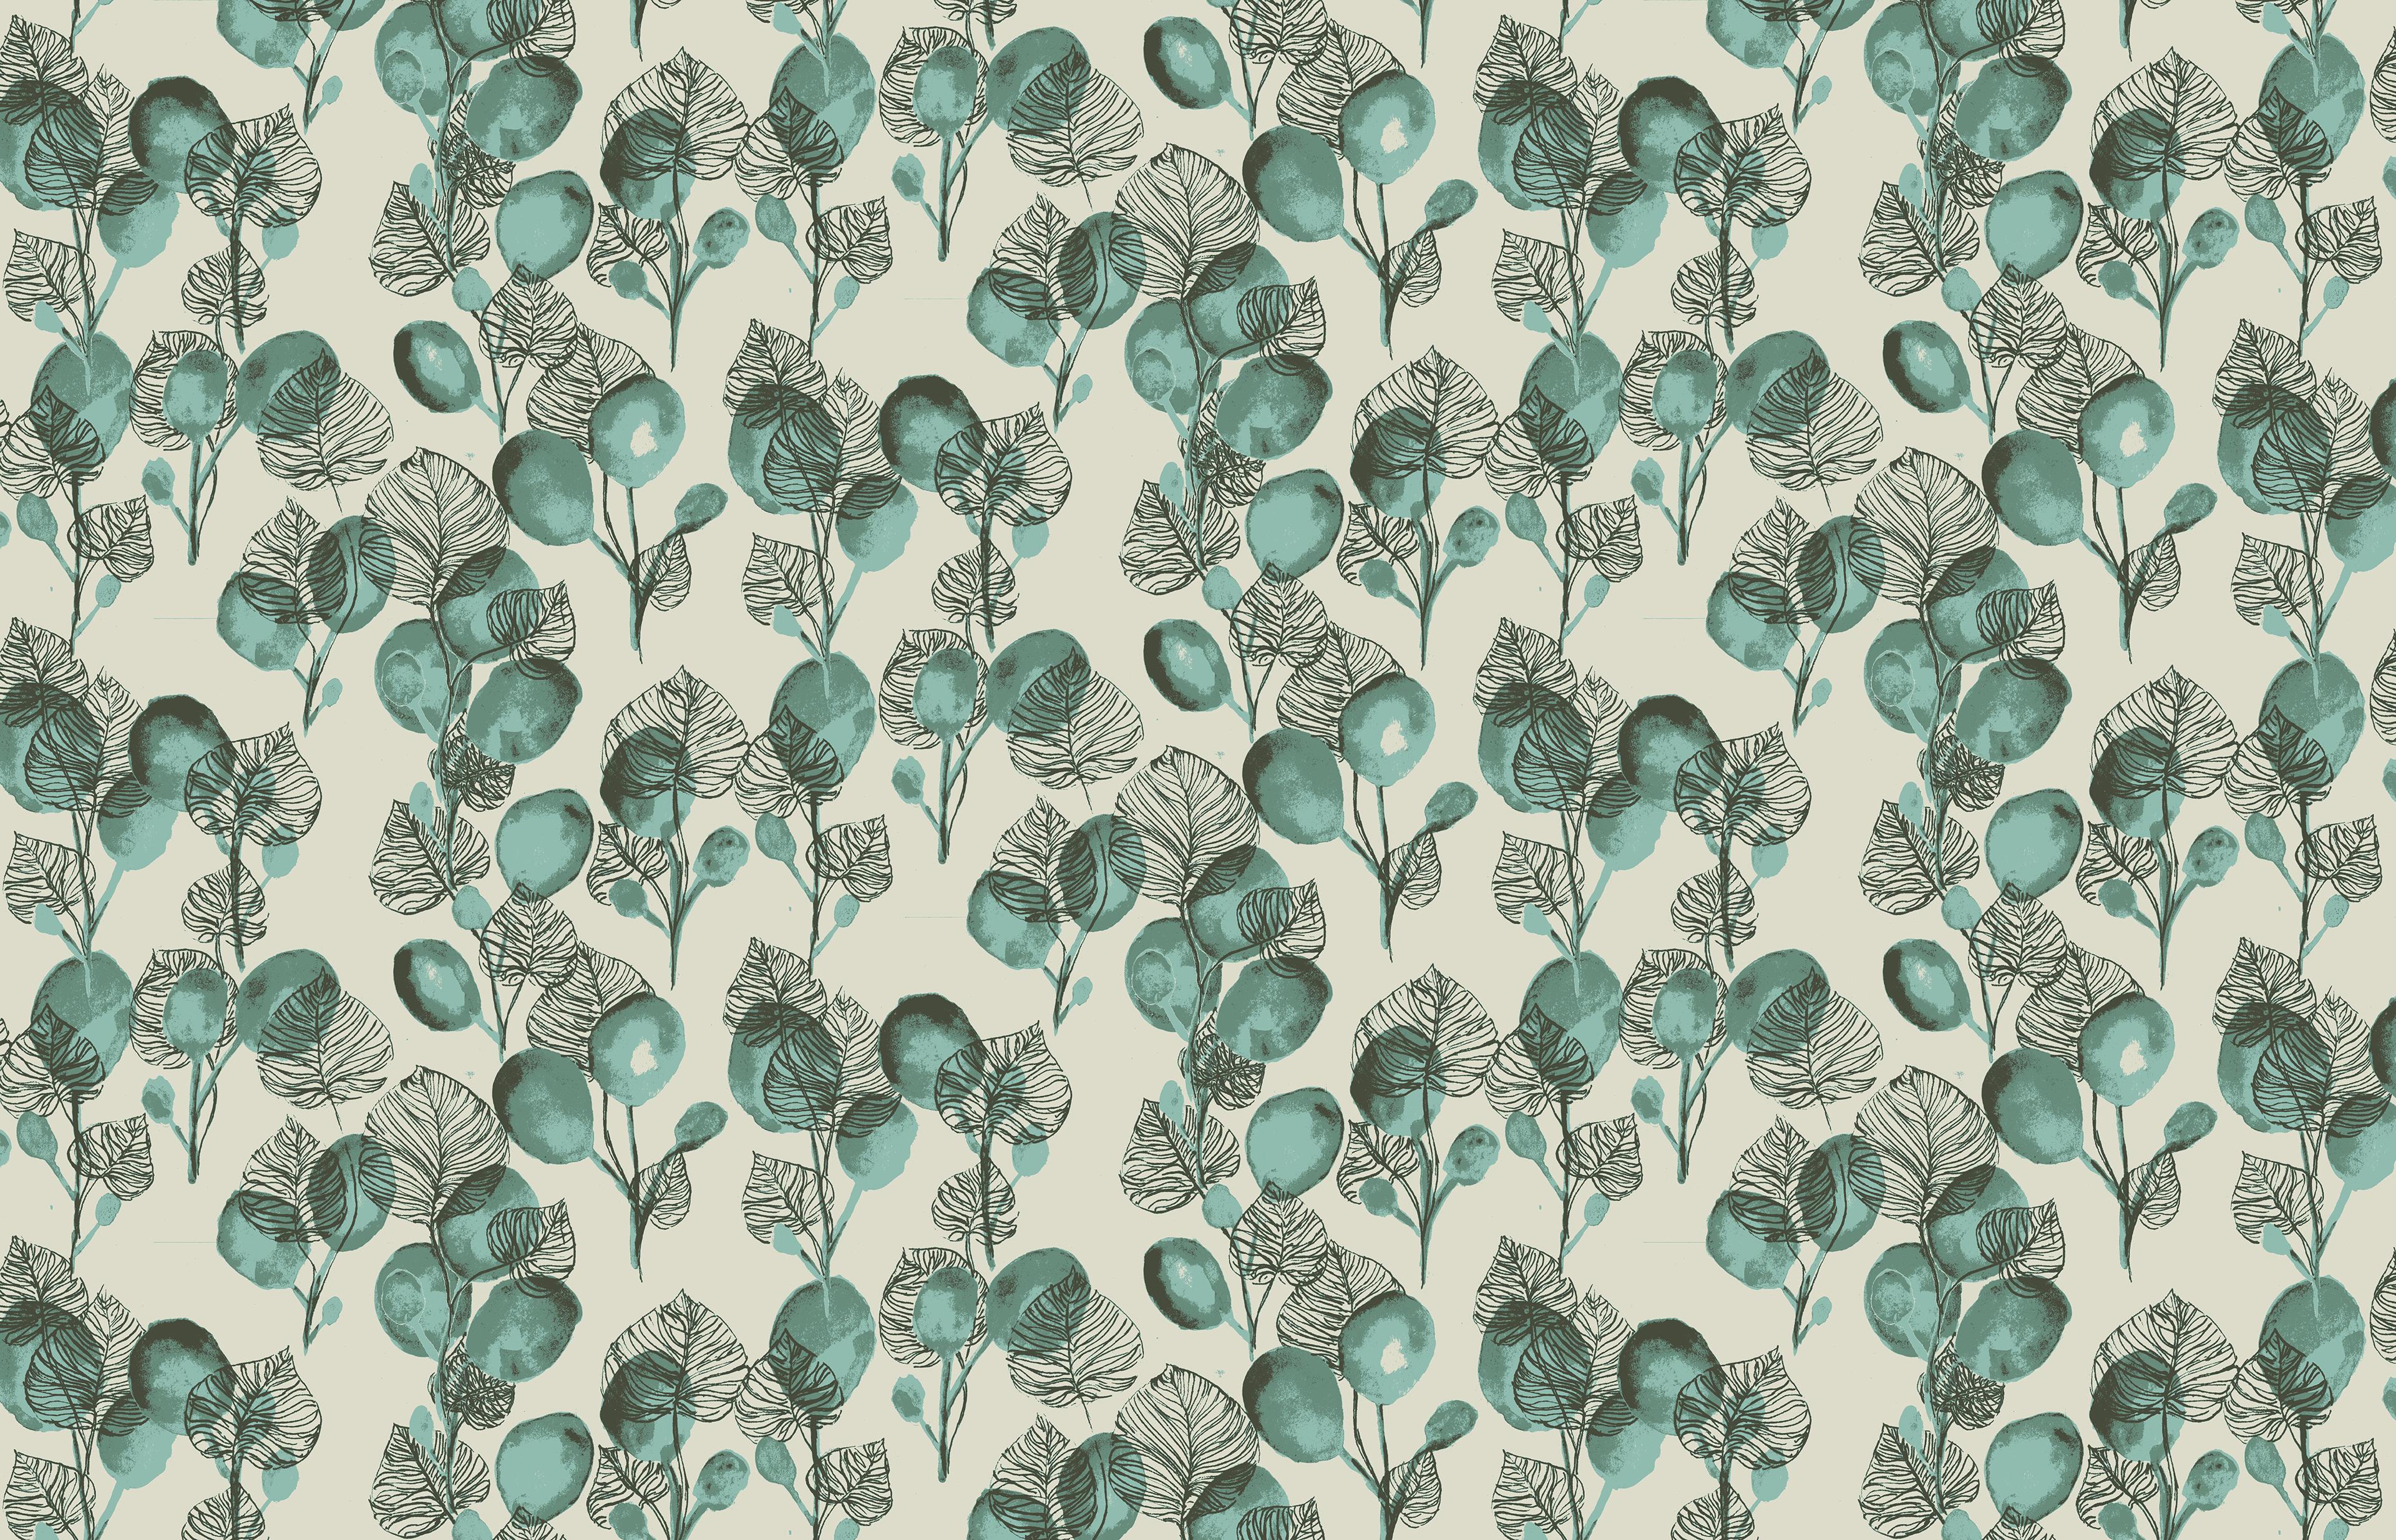 Prerana Karki - Floral Patterns